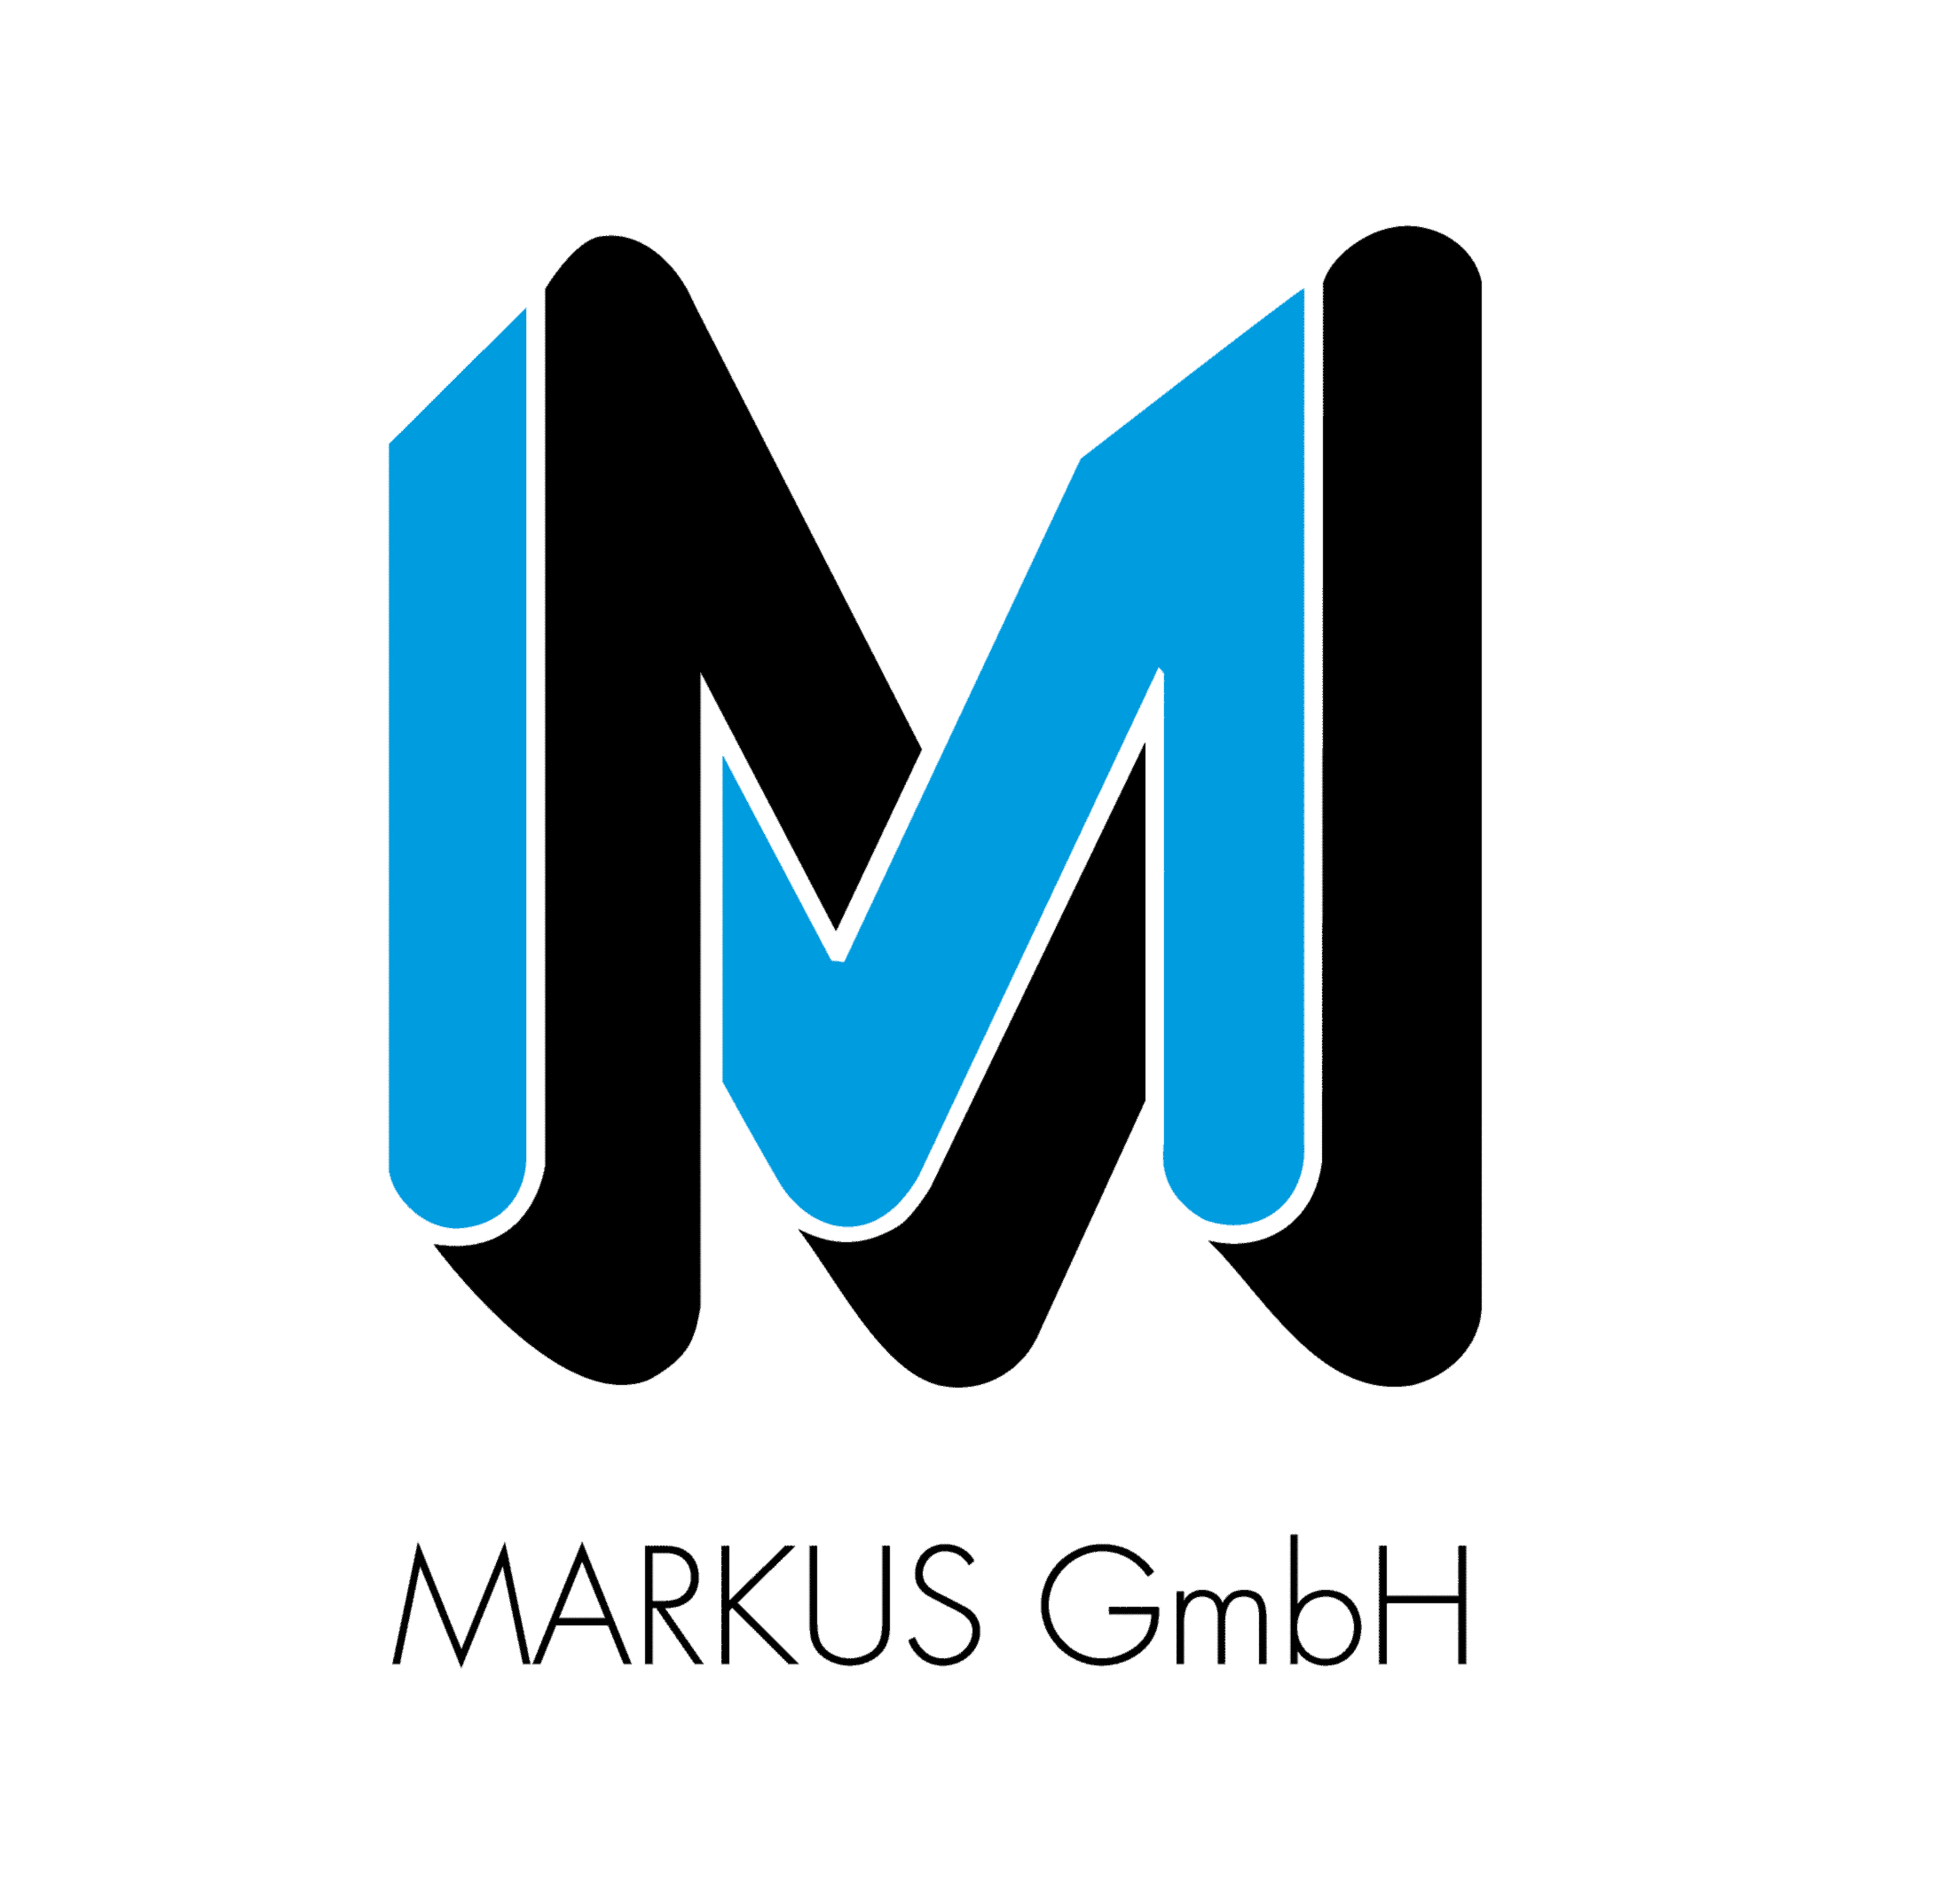 Markus GmbH